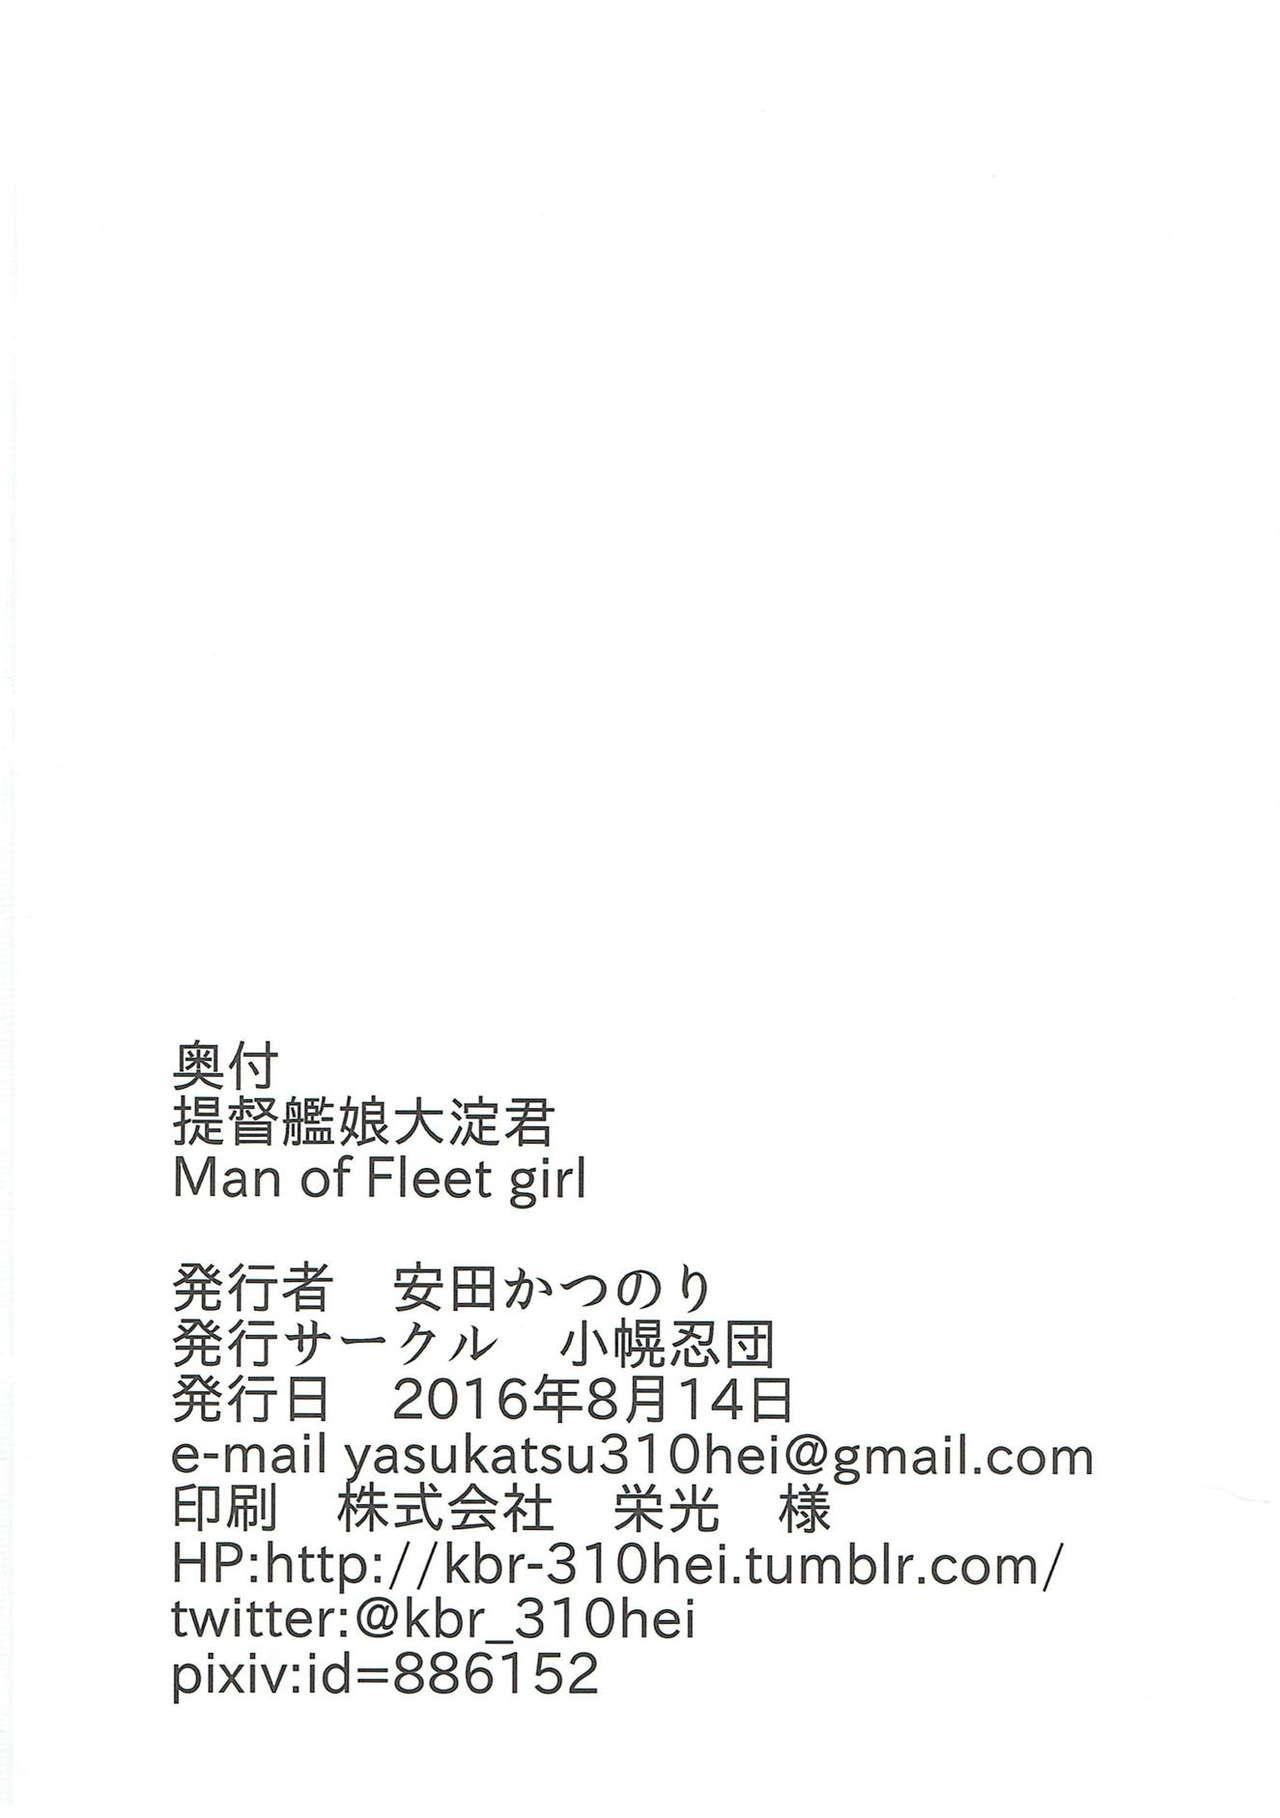 Teitoku Kanmusu Ooyodo-kun Man of Fleet girl 20